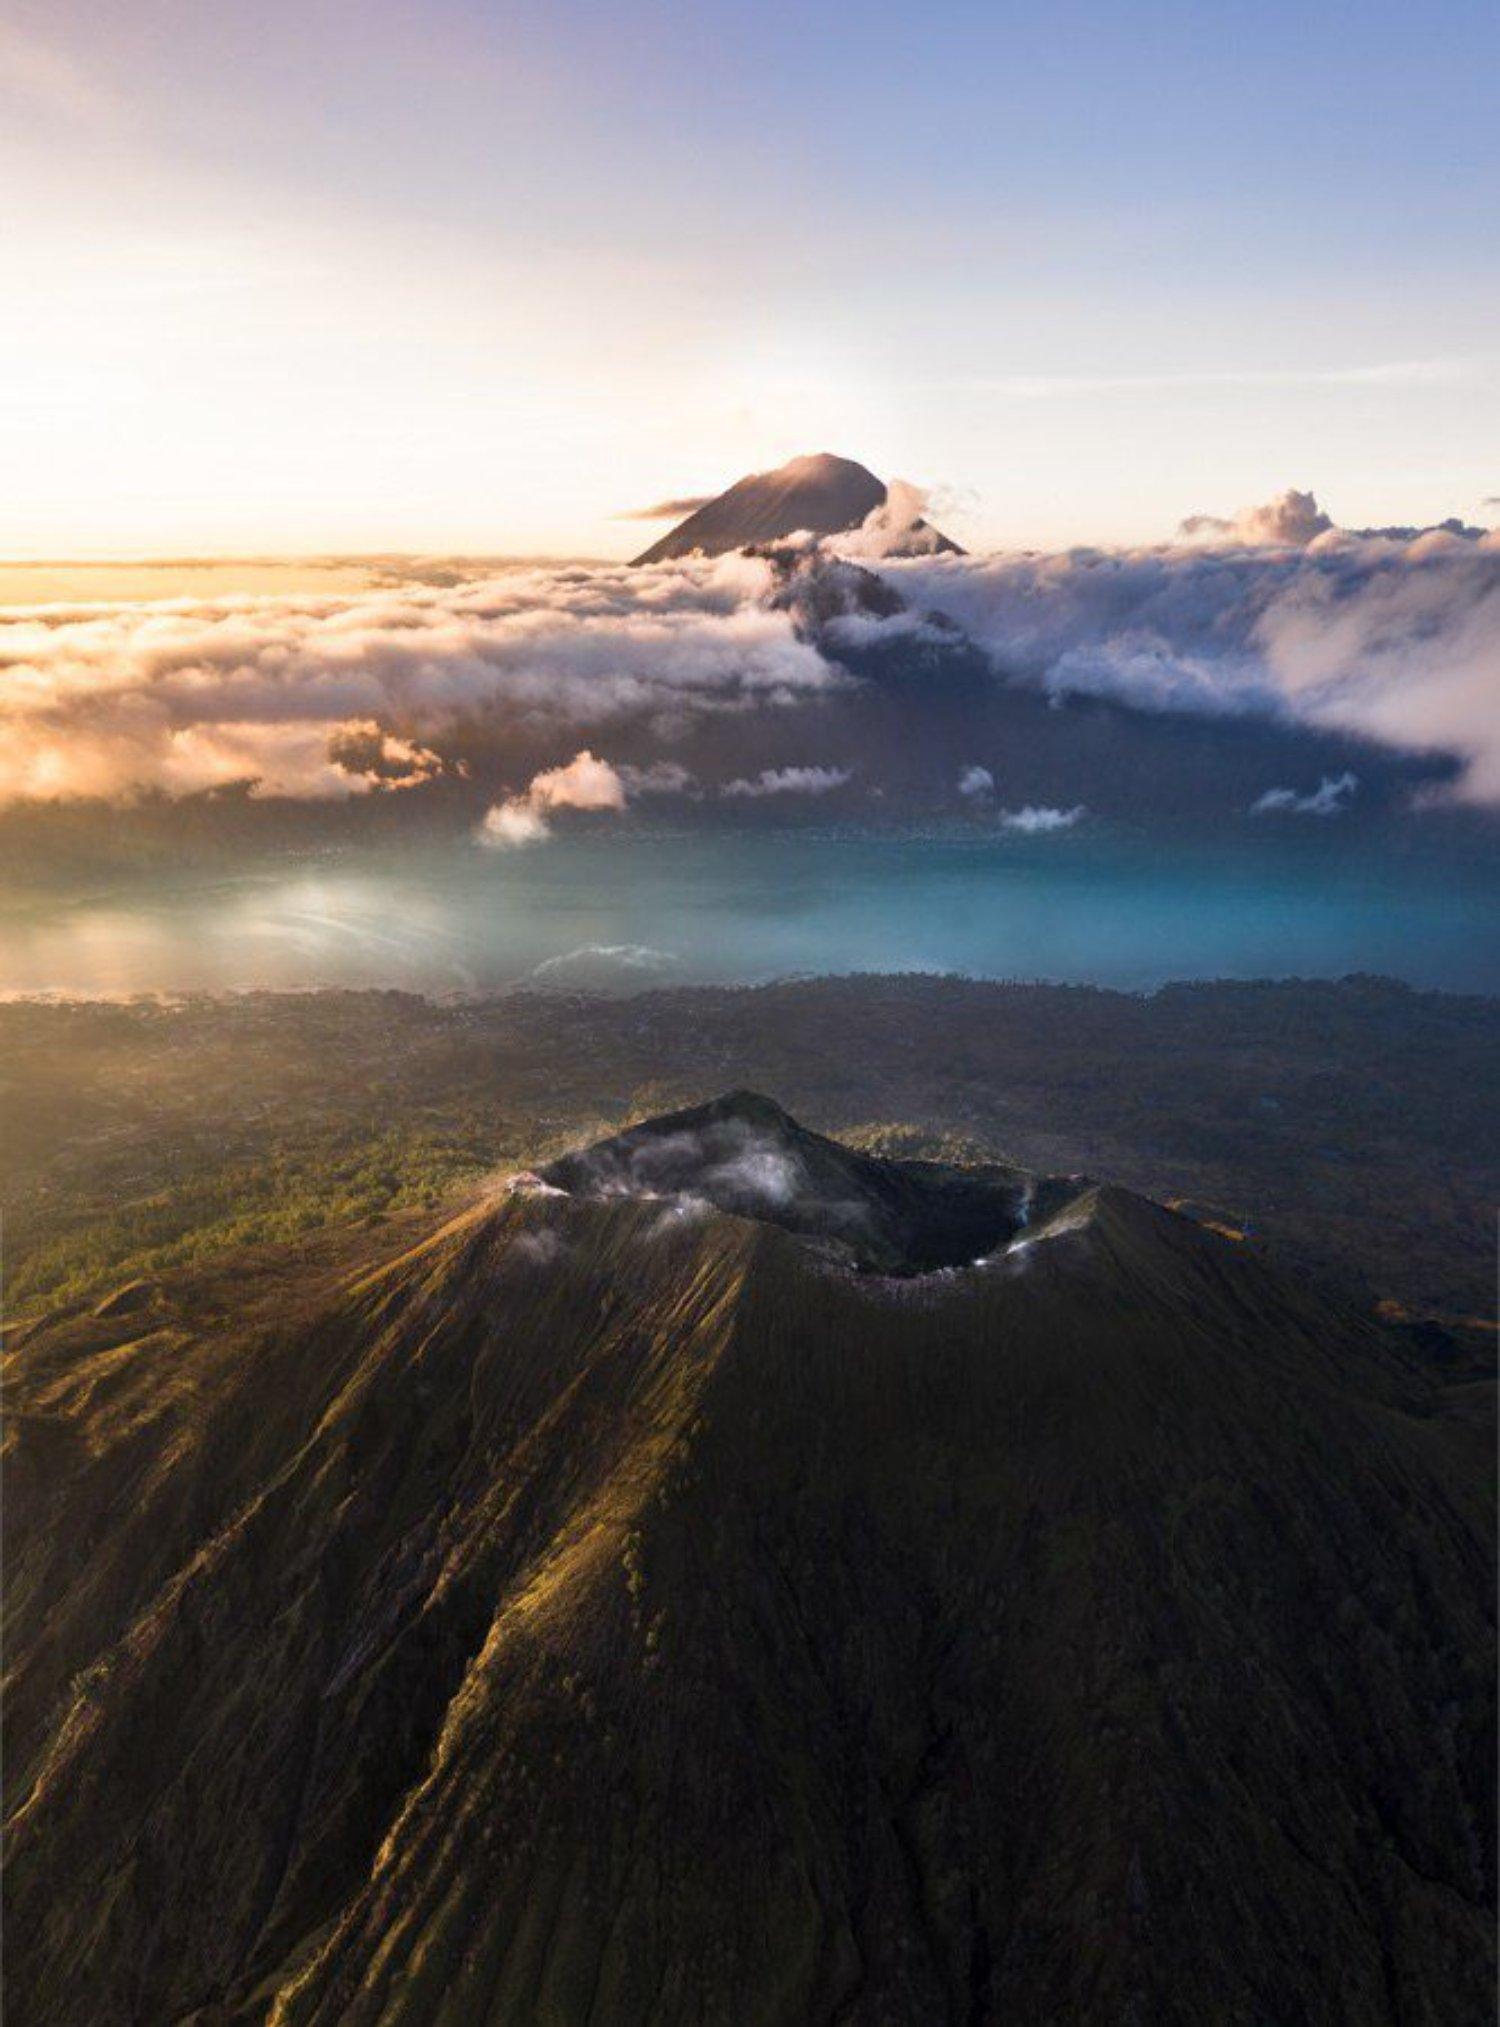 mount batur sunrise trekking bali DJI_0560 Pano